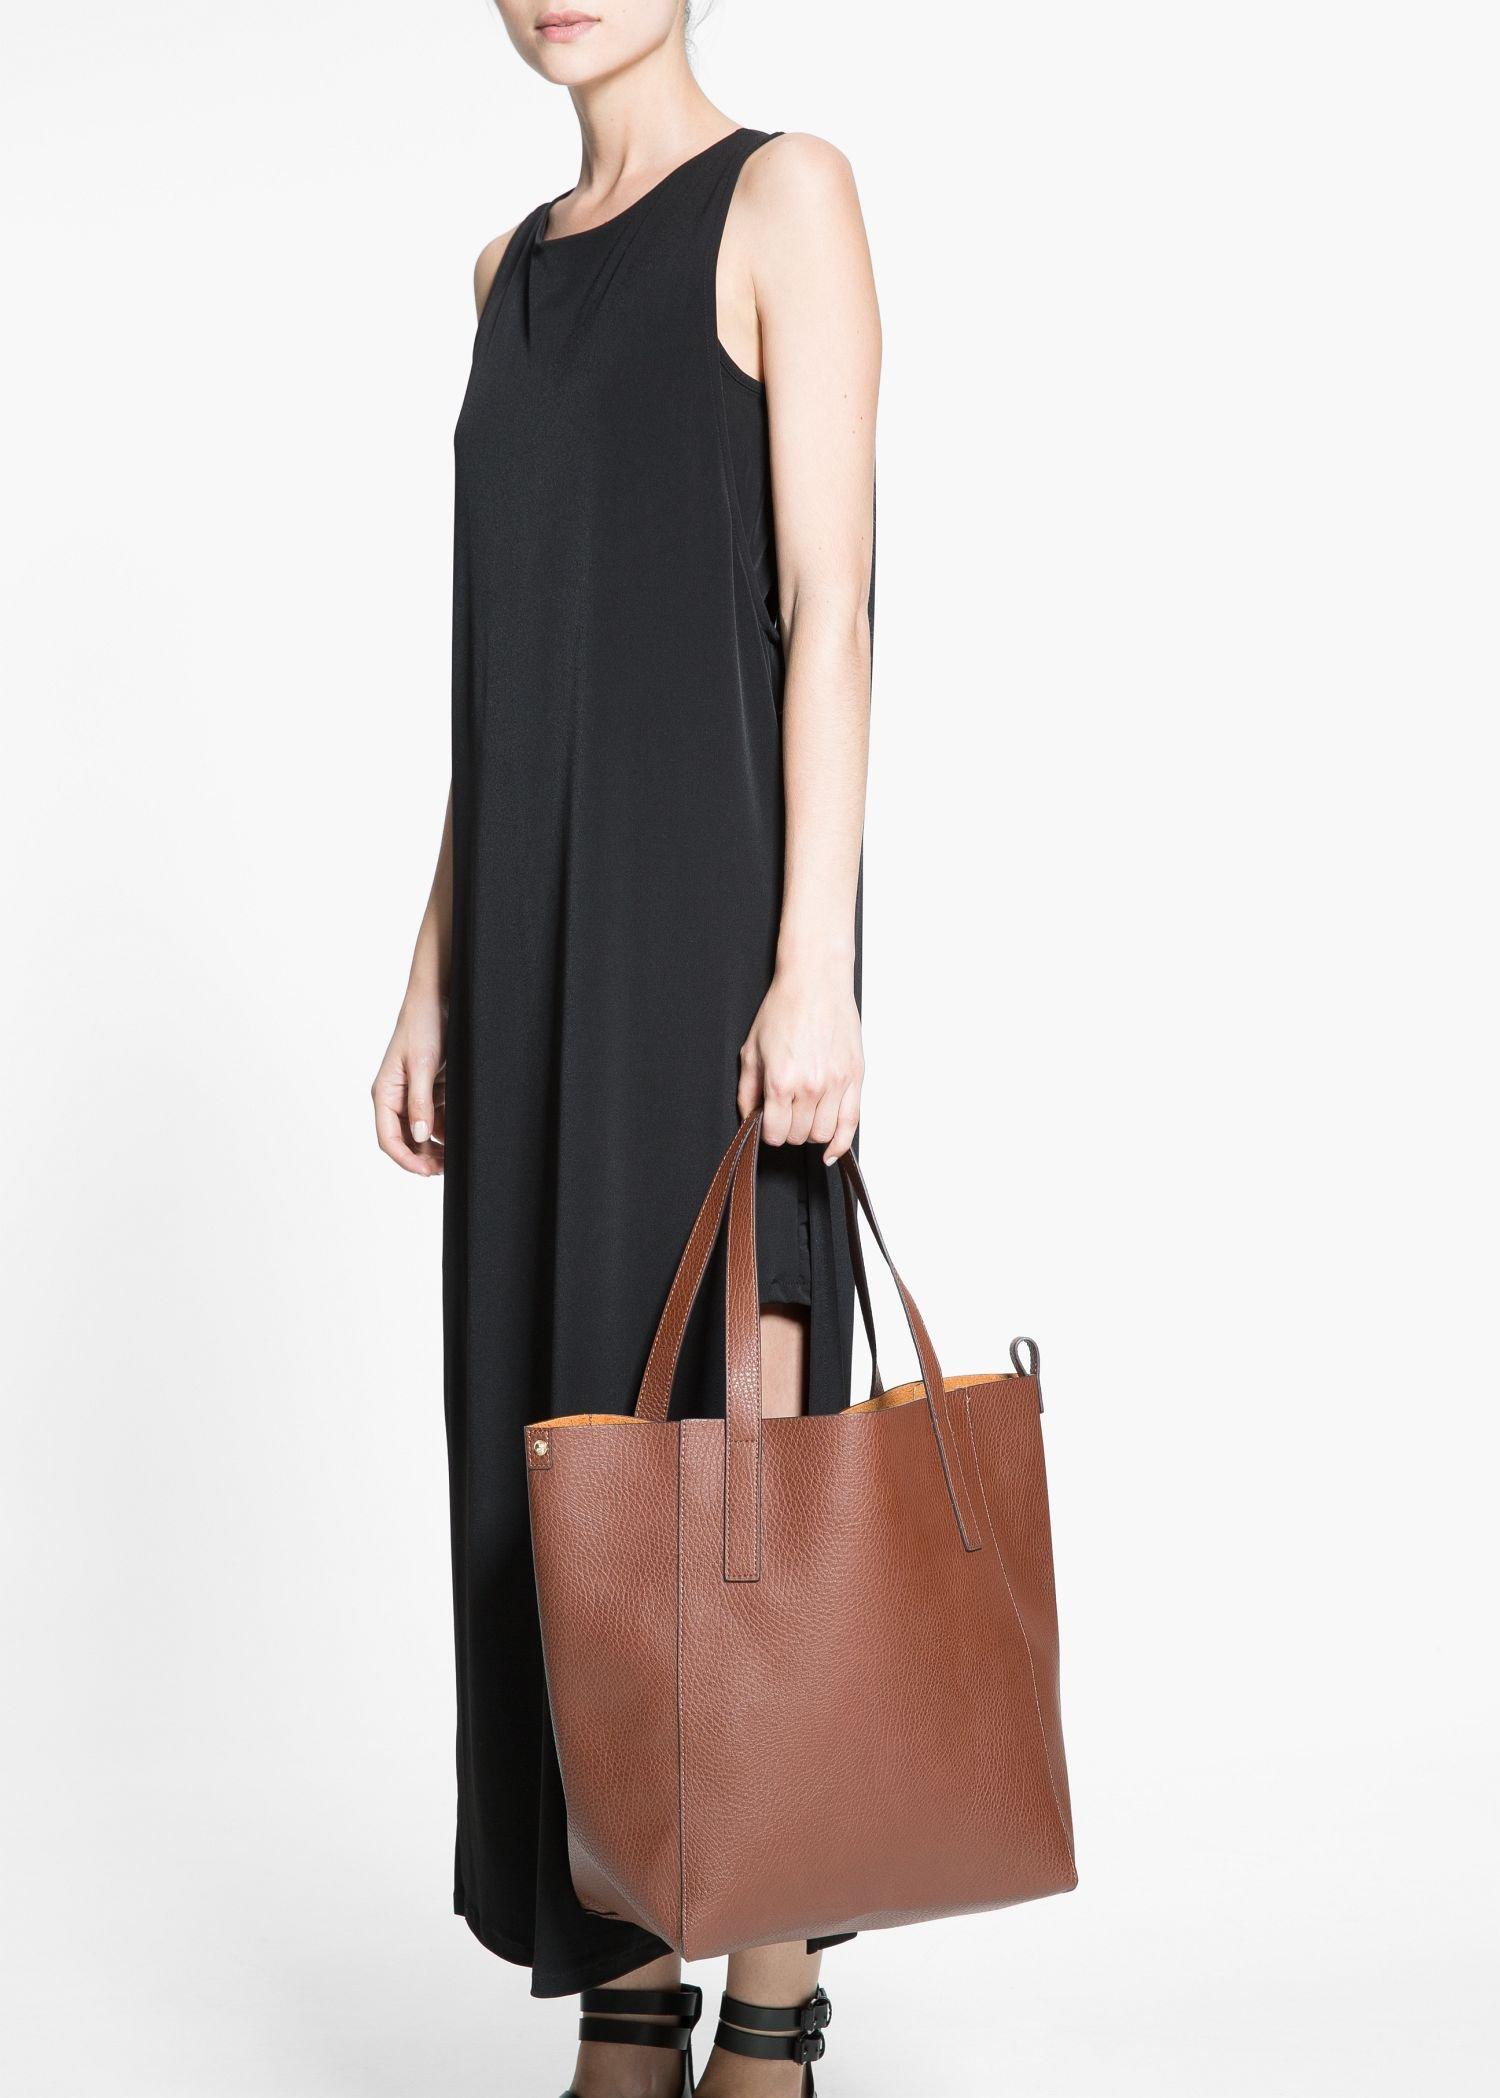 Super Lyst - Mango Faux-Leather Shopper Bag in Brown MZ27